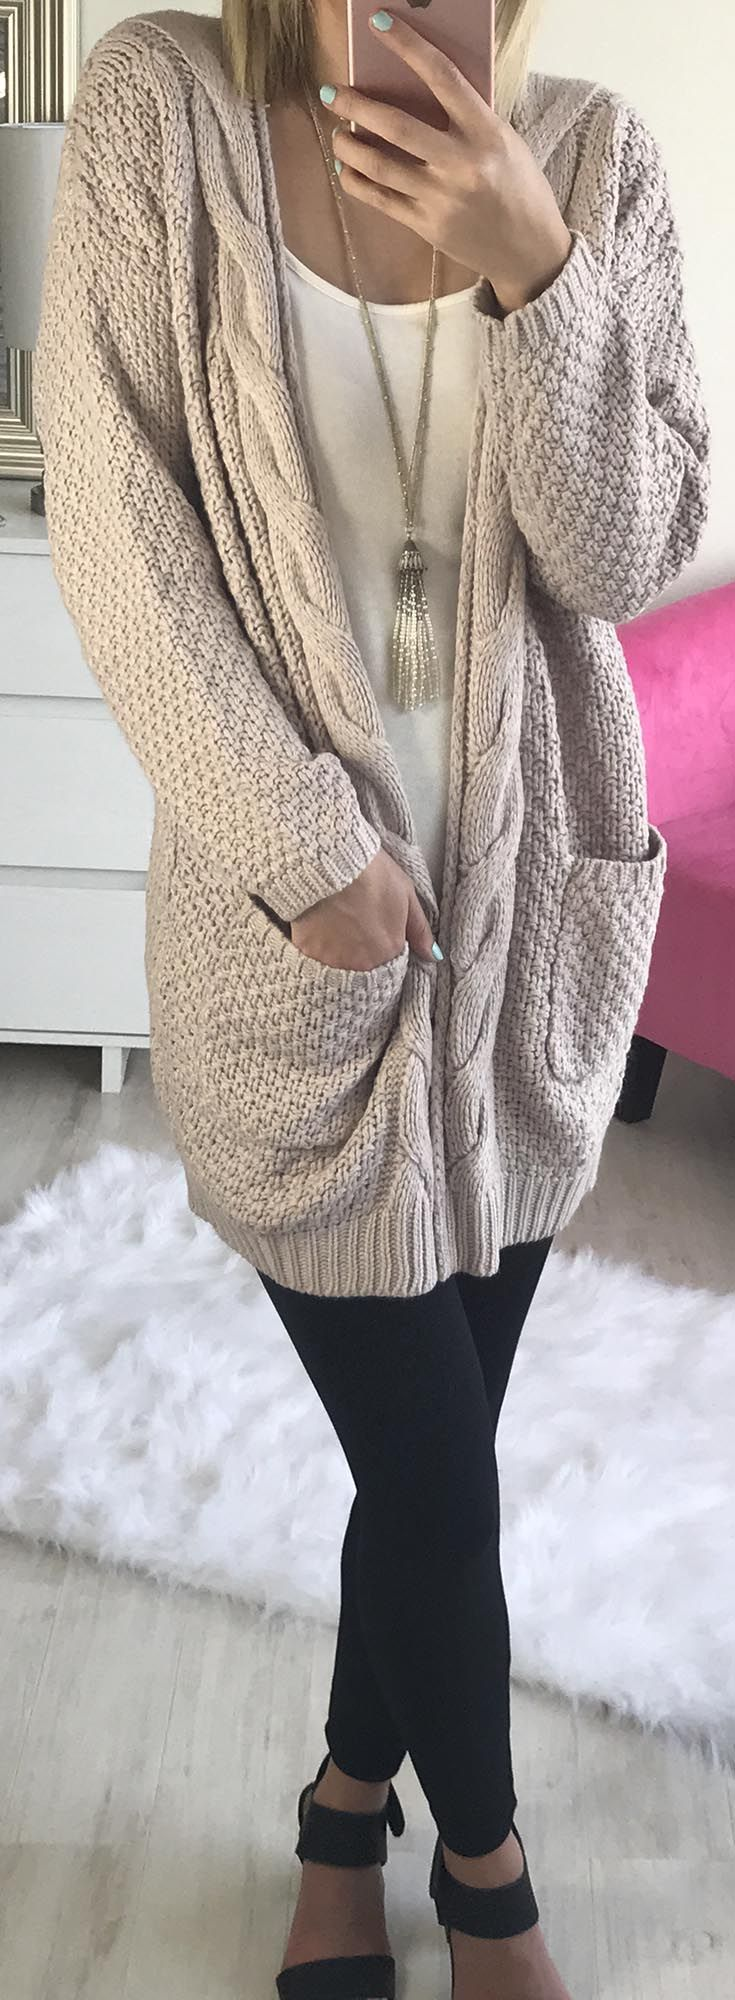 Chunky Cardi Fall Outfit ideas